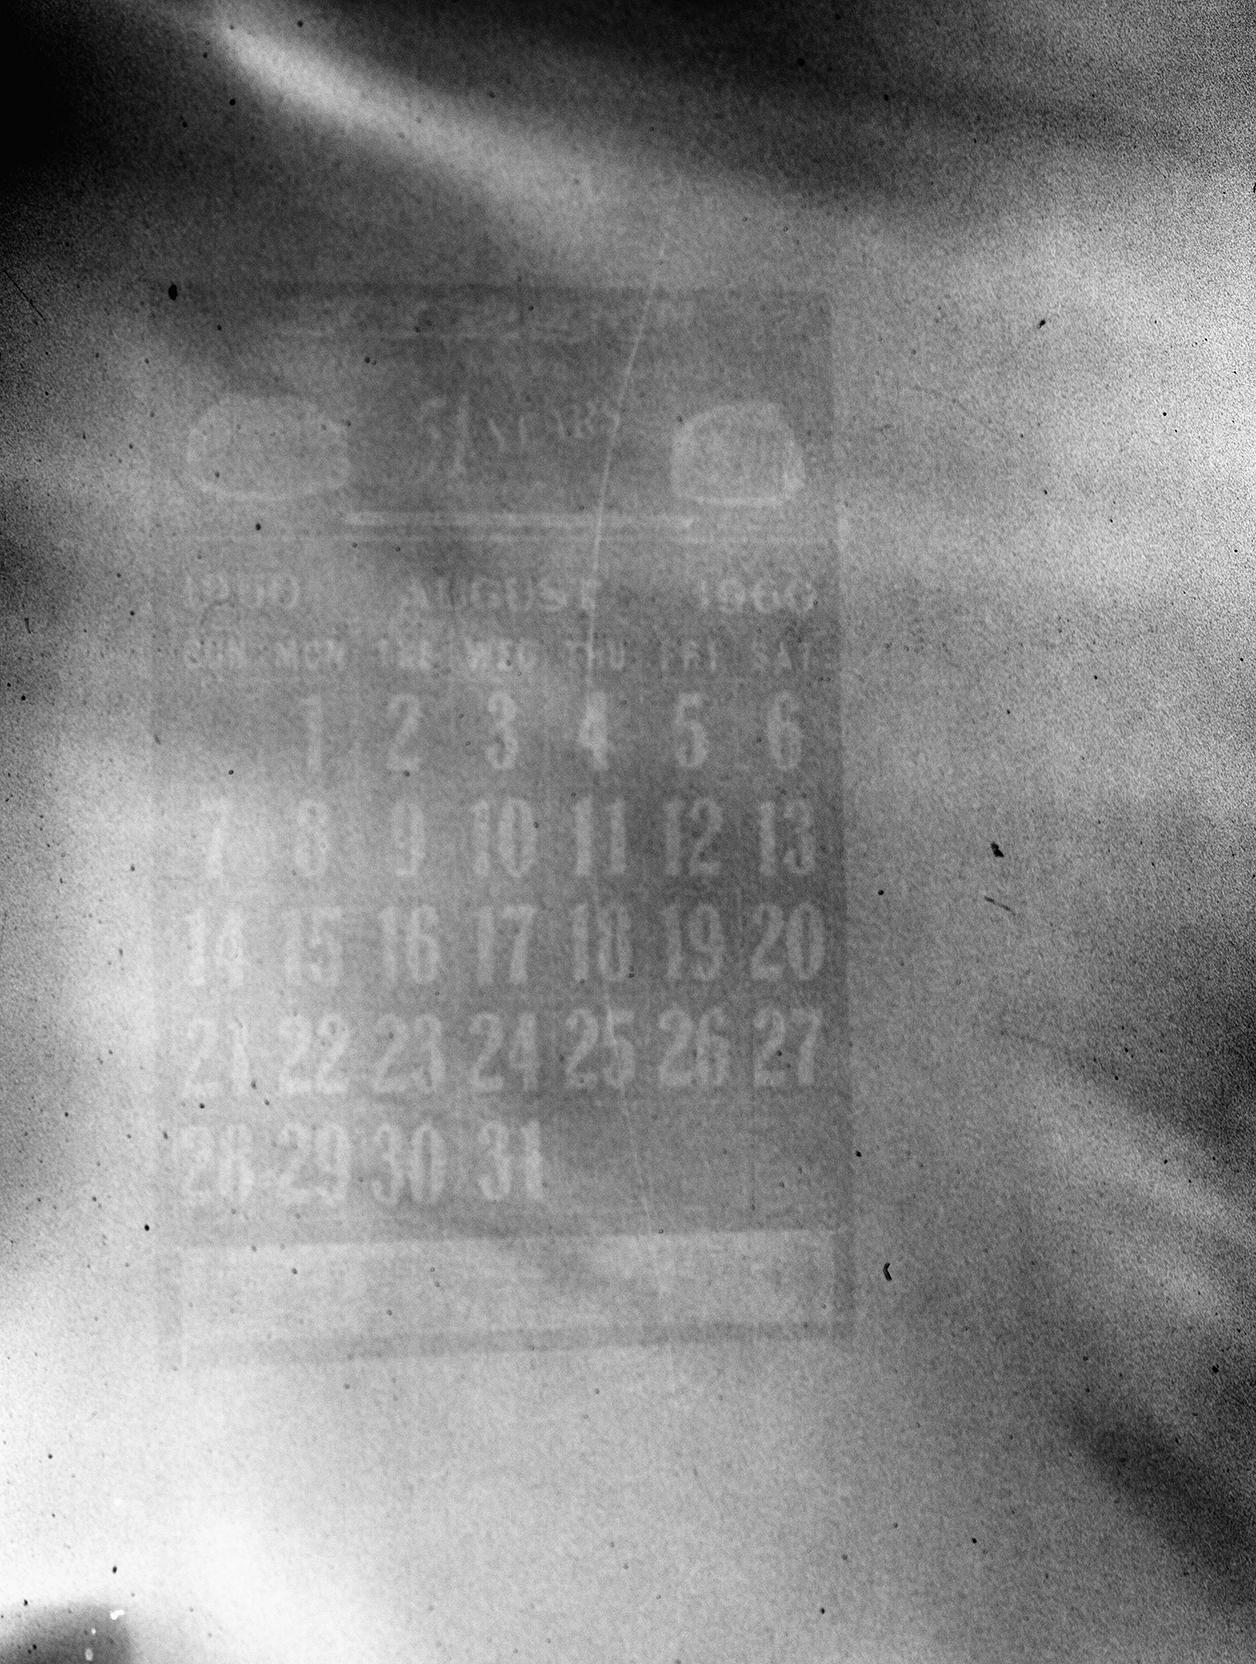 Paul Bundle 18 Roll 8 005.jpg